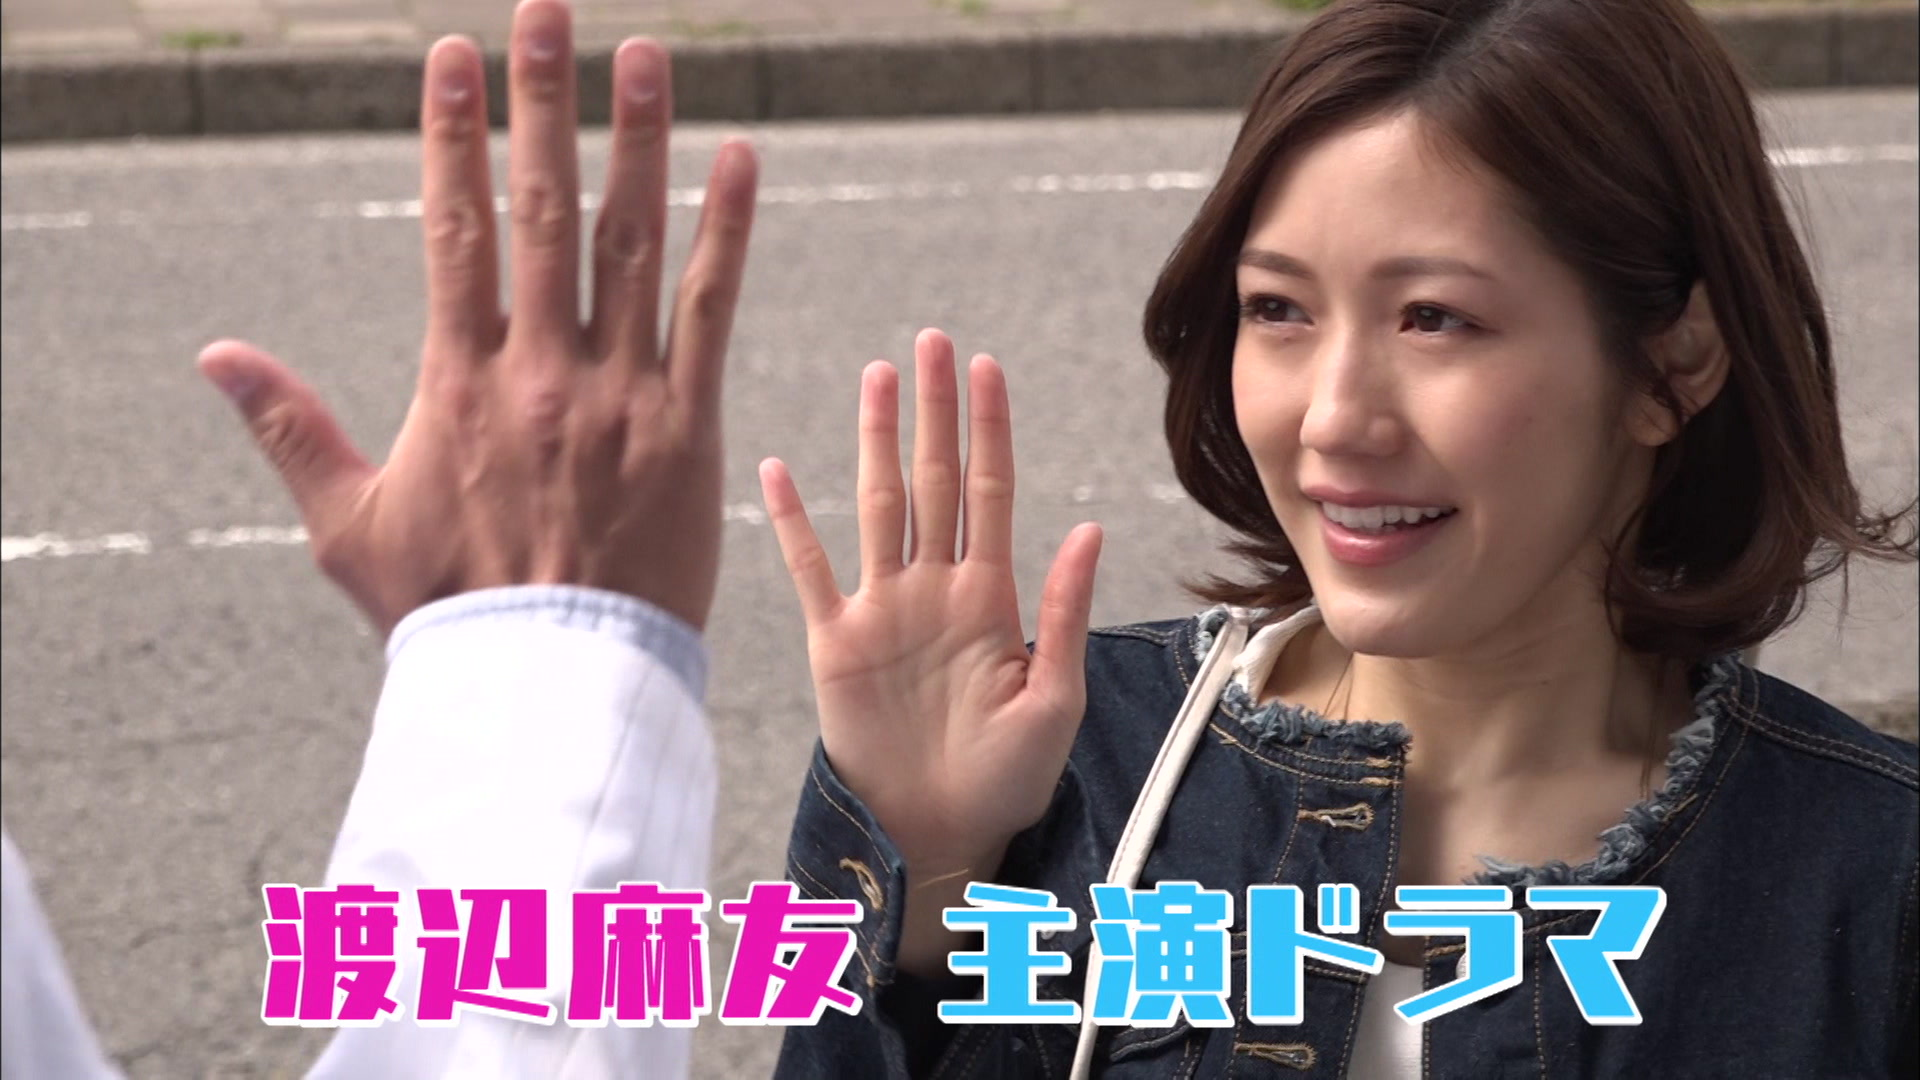 Trailer: Good-bye, Enari-kun